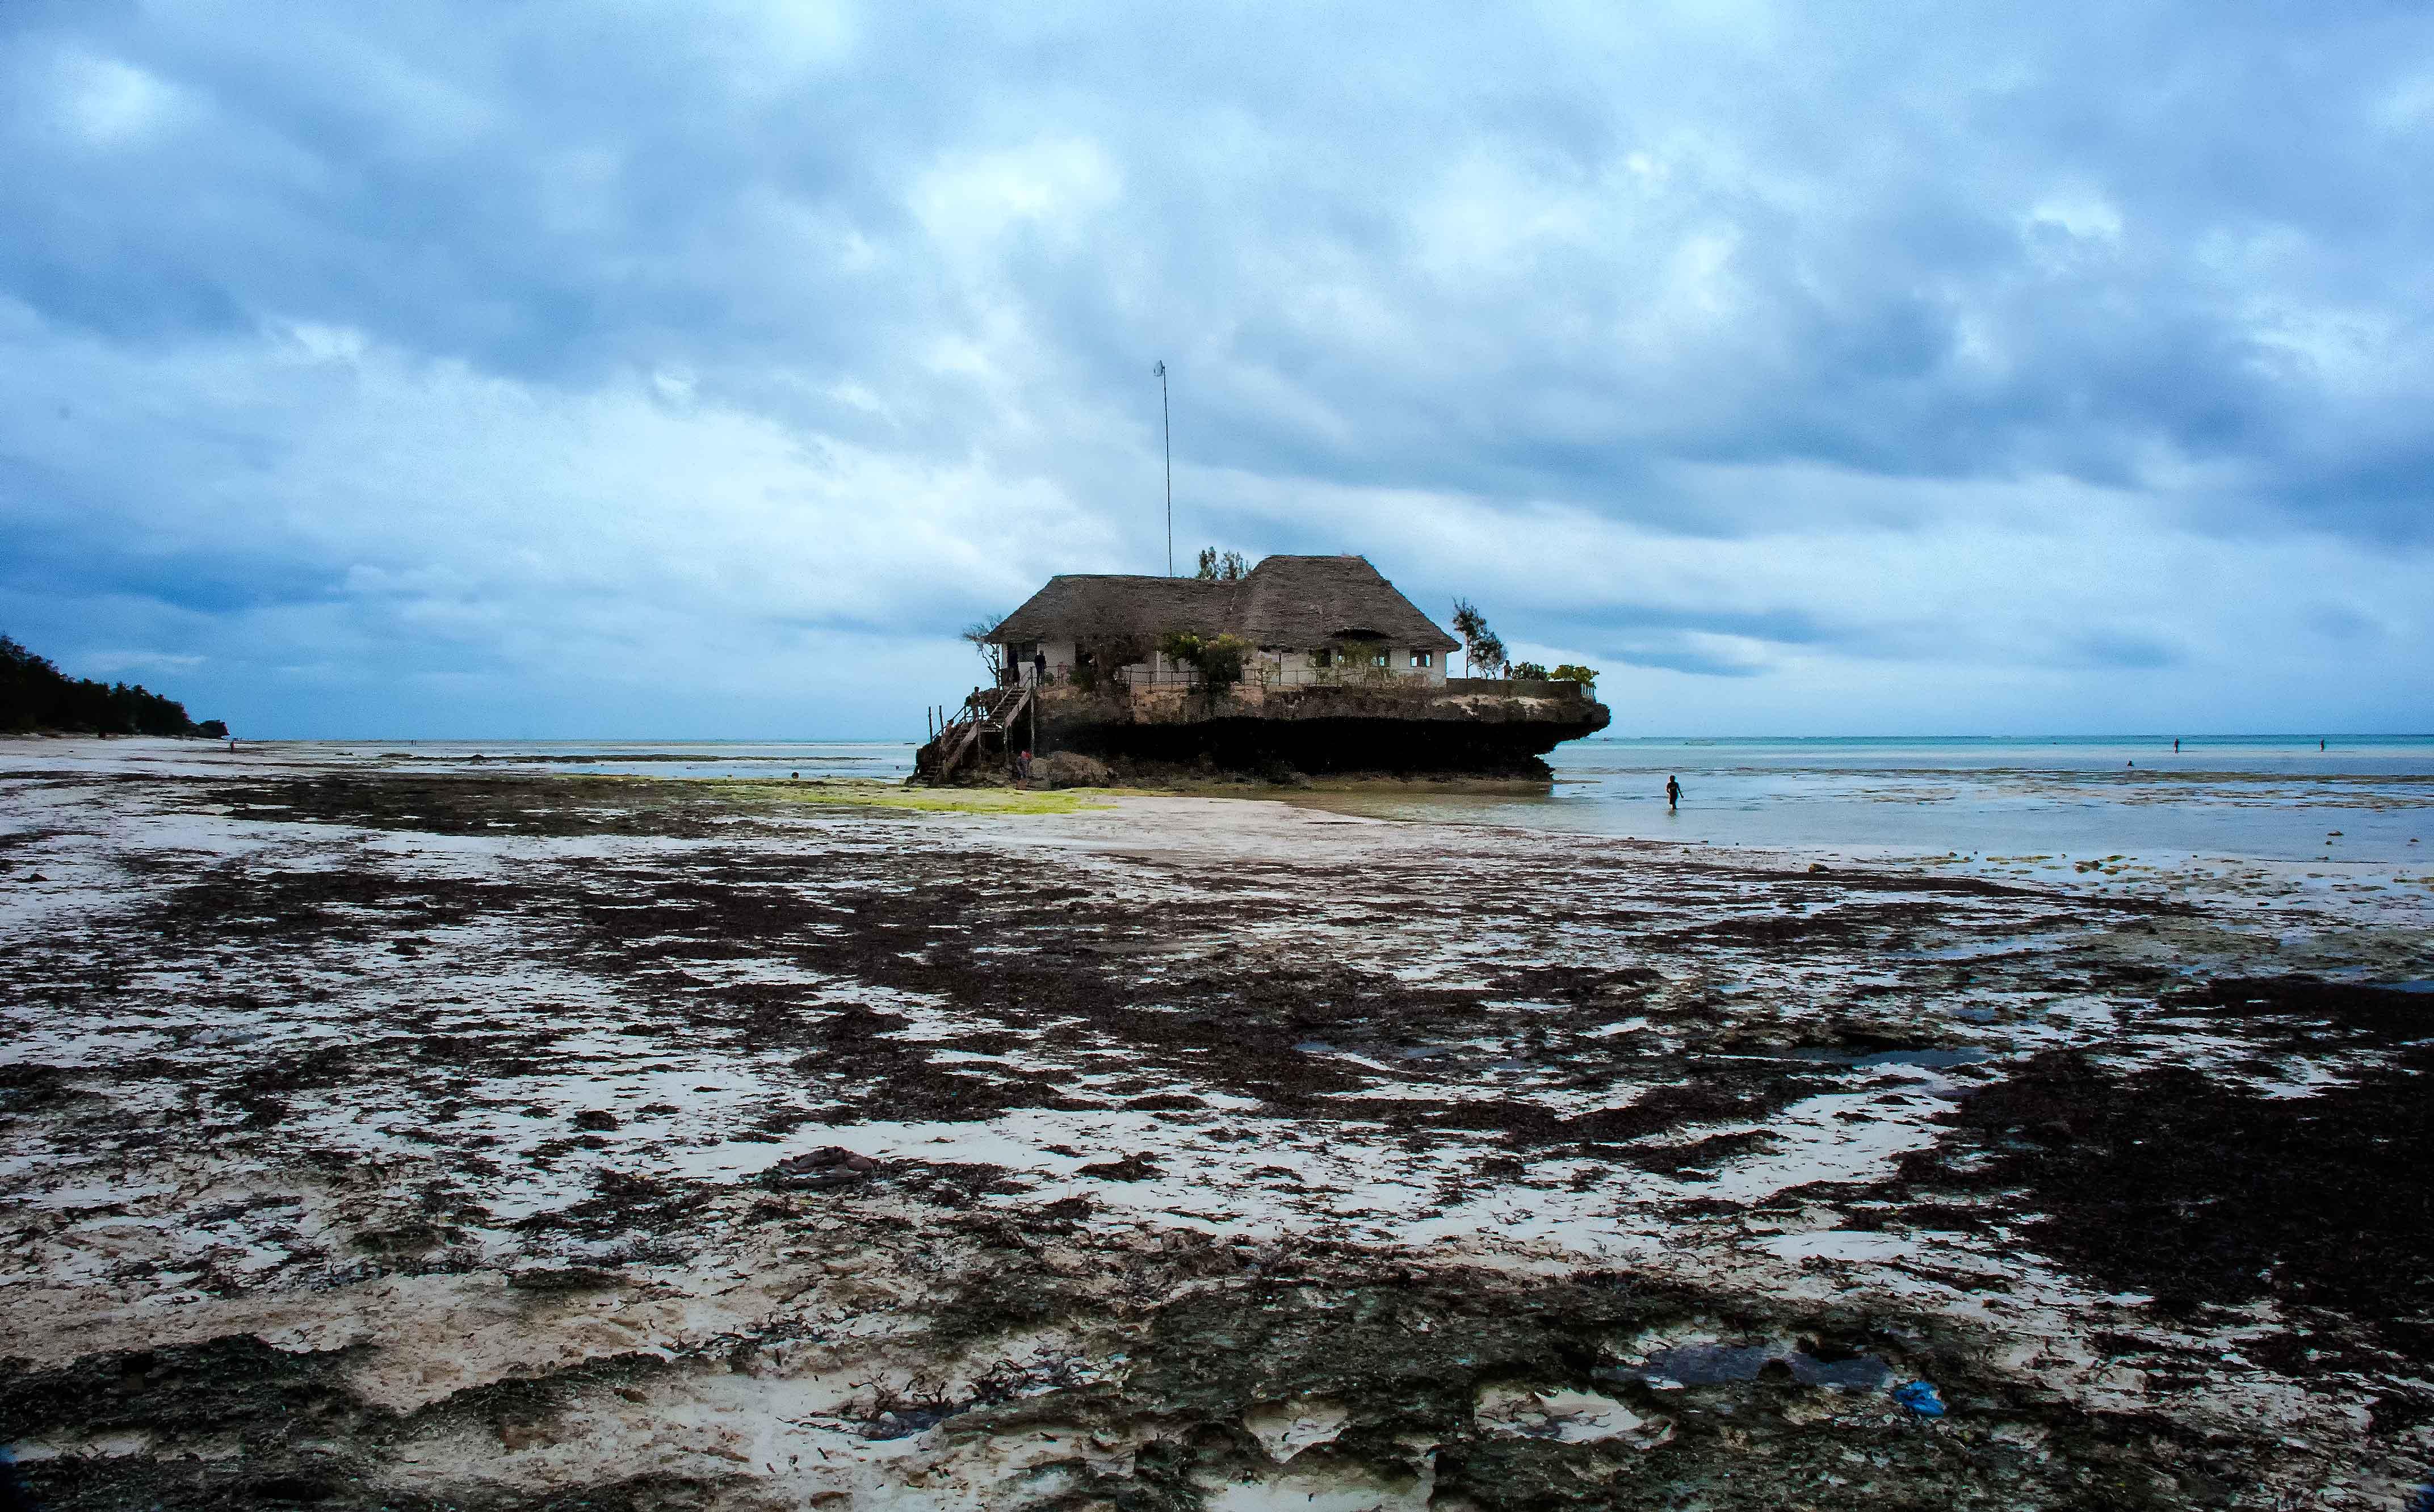 Agreable File:The Rock Restaurant, Zanzibar (17197688480)